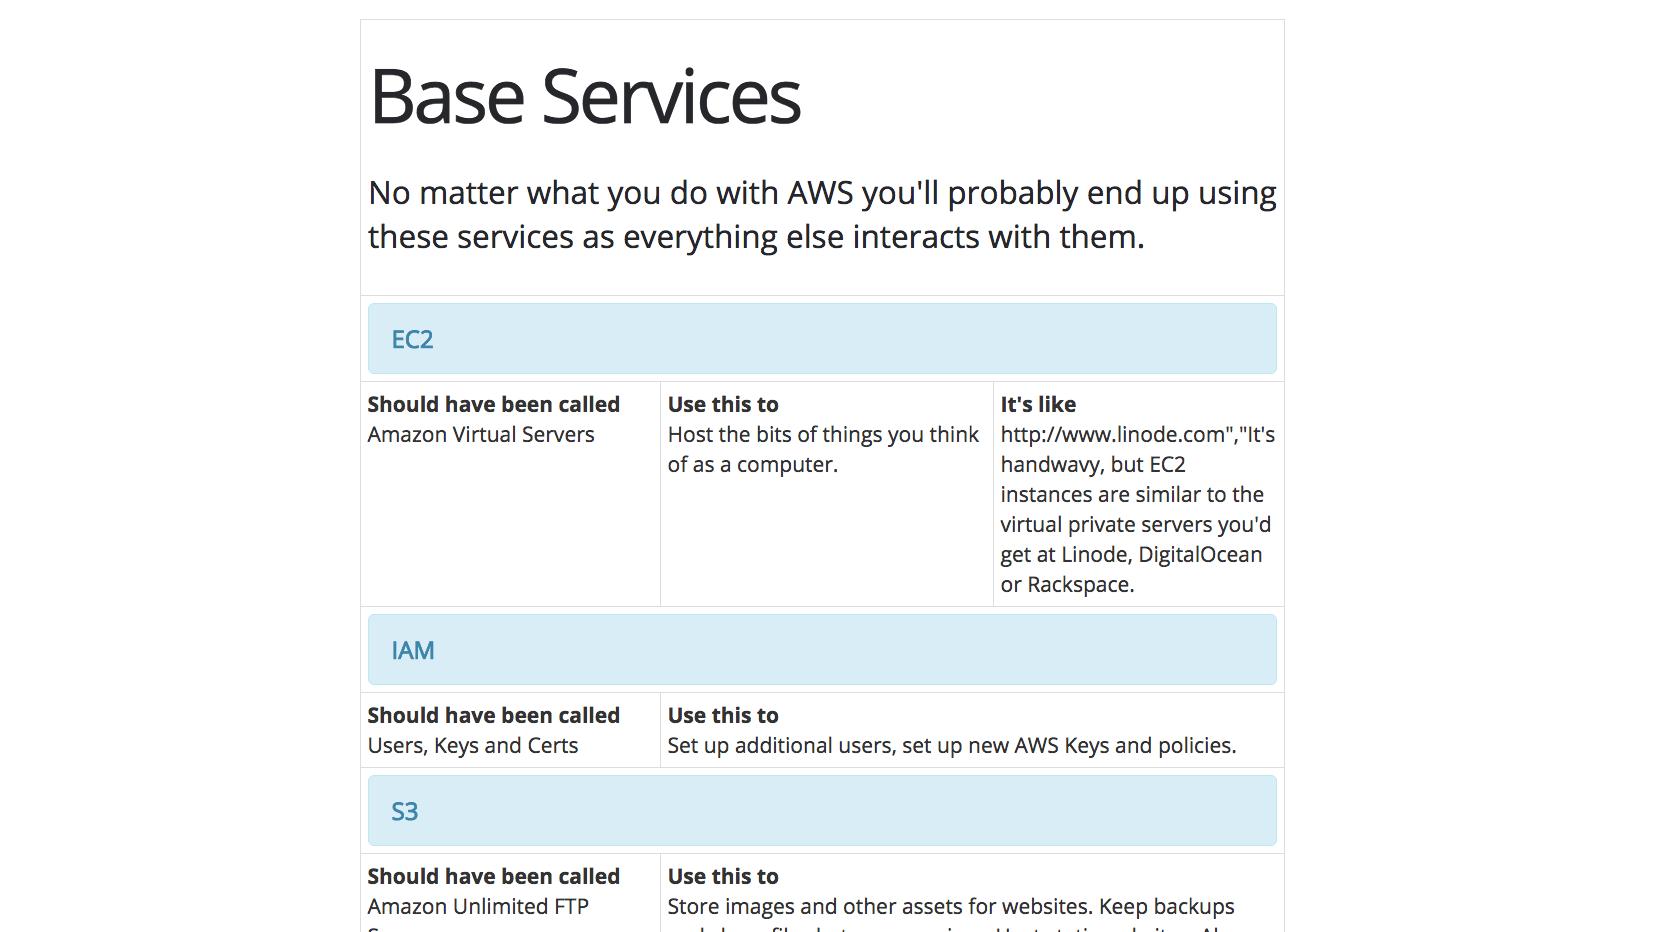 Making Sense of Amazon Web Services